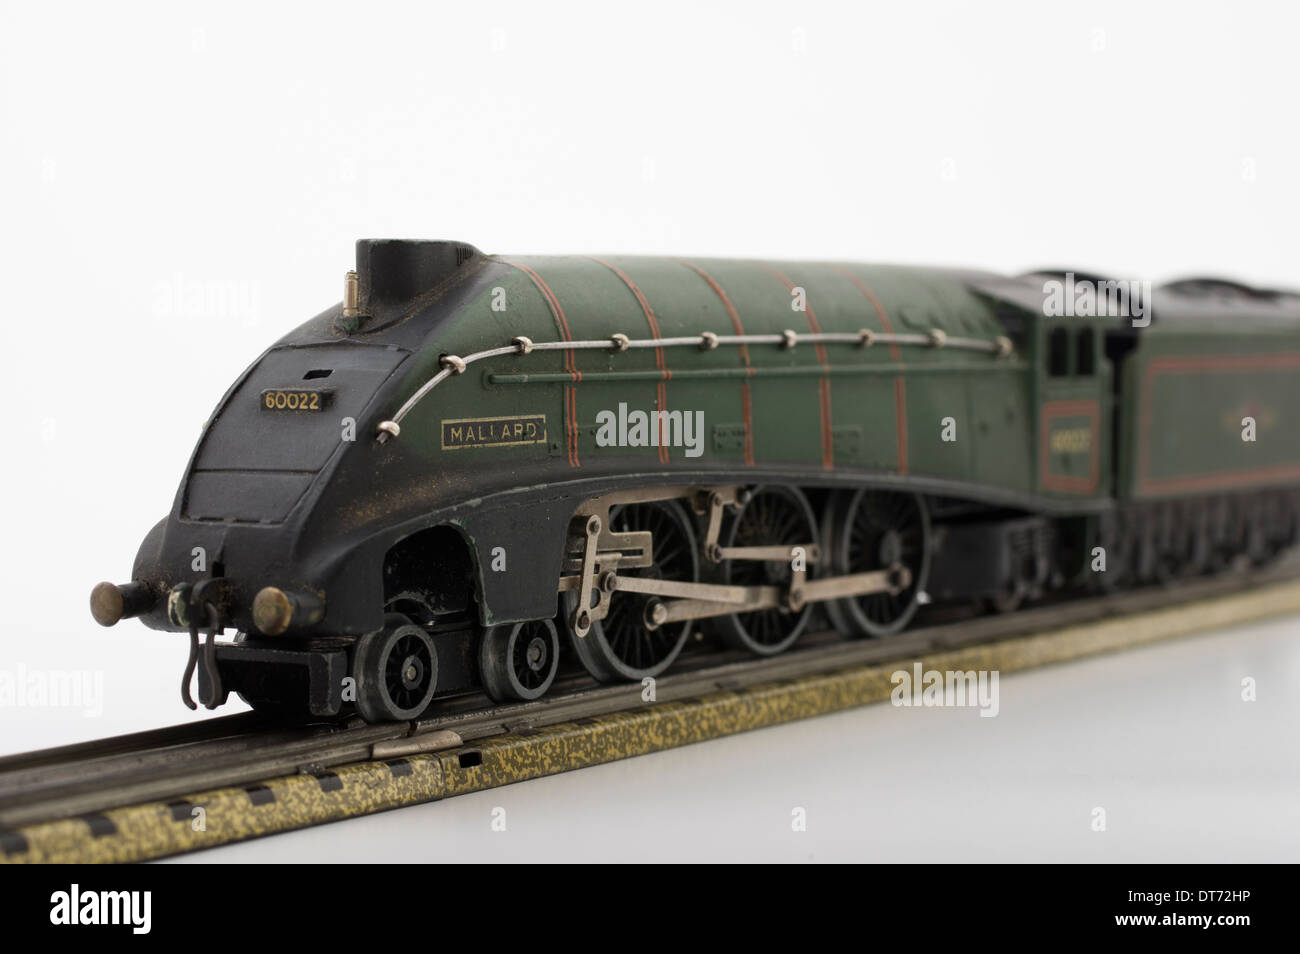 Hornby Dublo Green Mallard Model Locomotive Train Classic Brtish Children's Toy - Stock Image